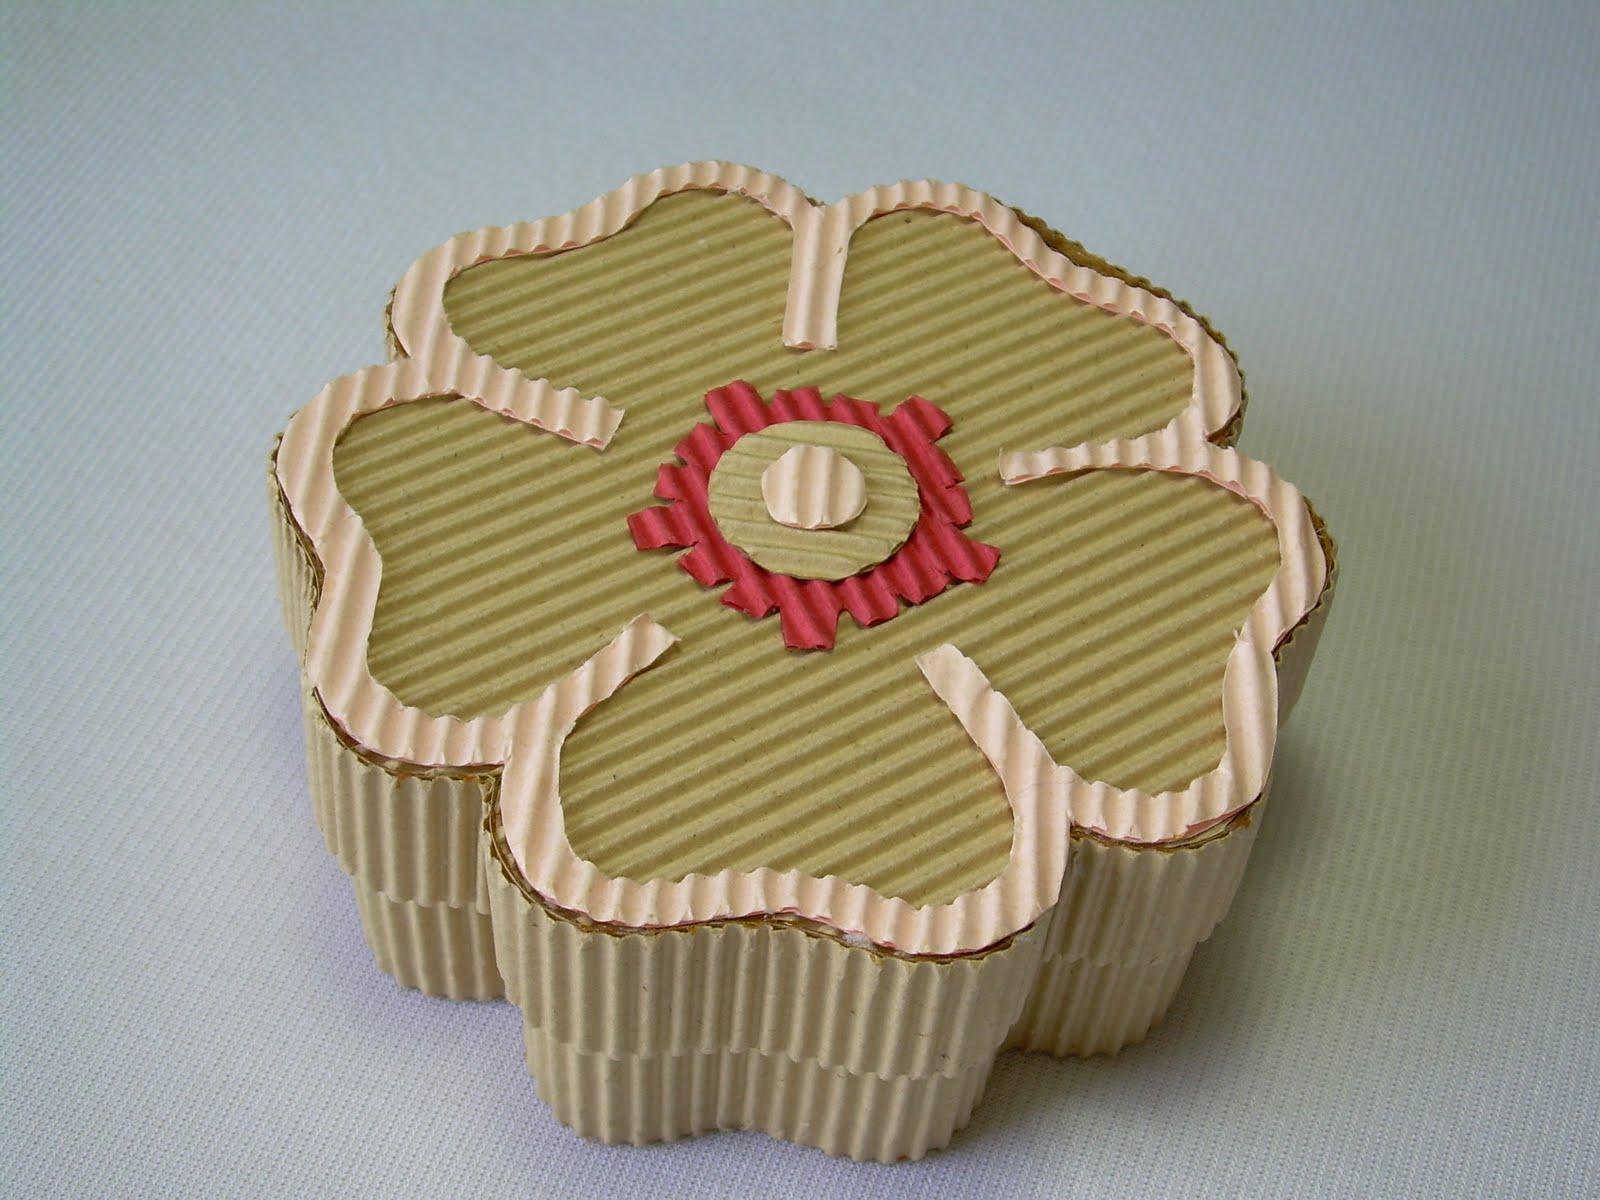 Artesanias divinus cajas decorativas para regalos - Cajas de almacenaje decorativas ...